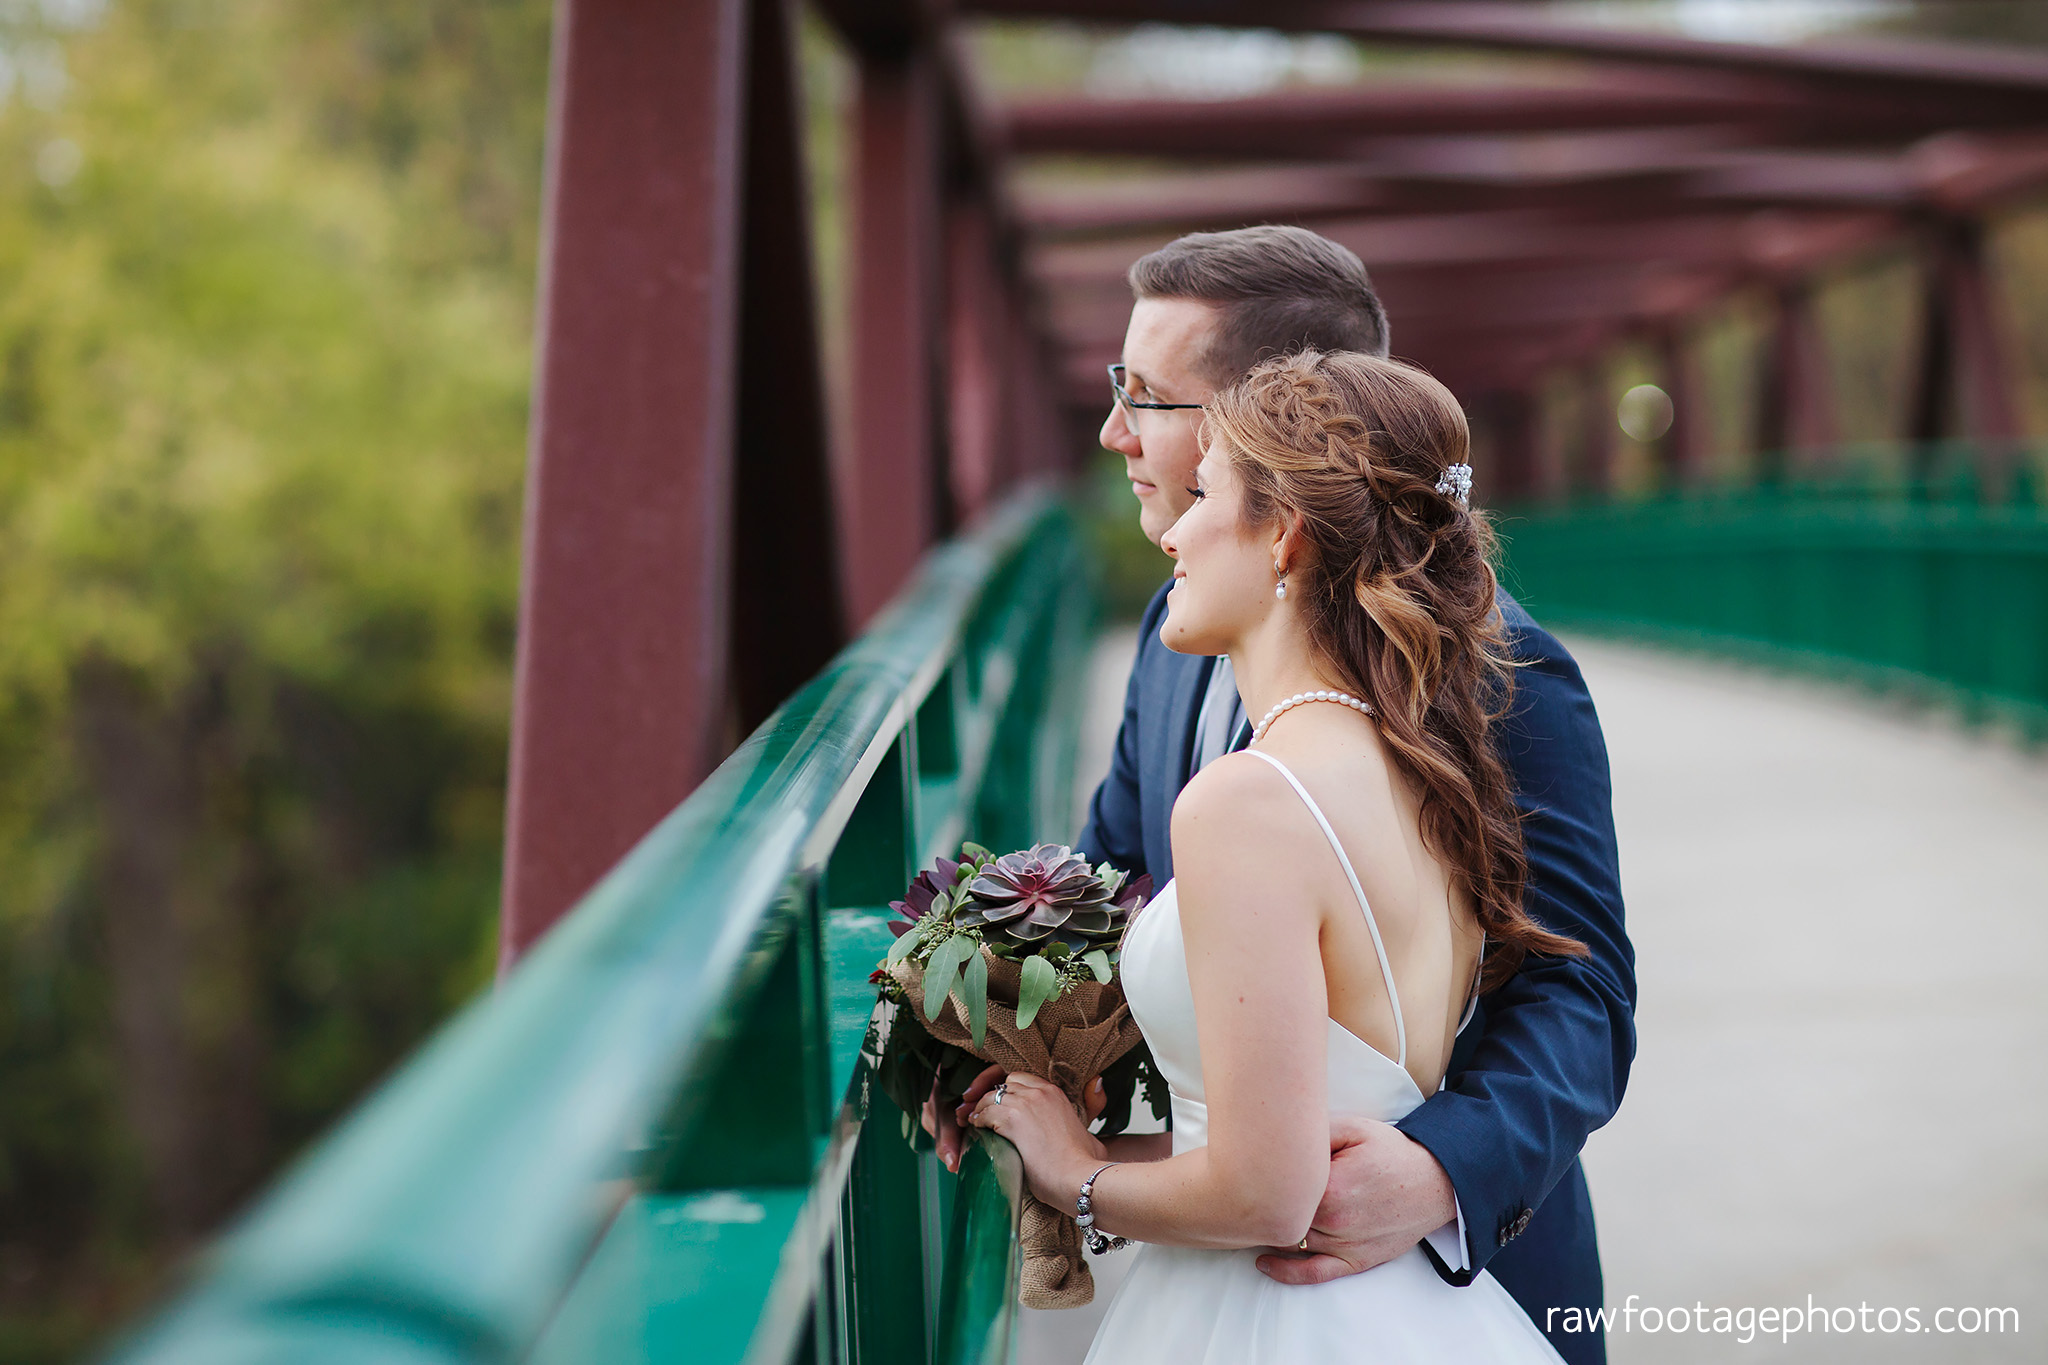 london_ontario_wedding_photographer-civic_gardens-springbank_park-succulent_bouquet-fall_wedding-bridge-raw_footage_photography070.jpg